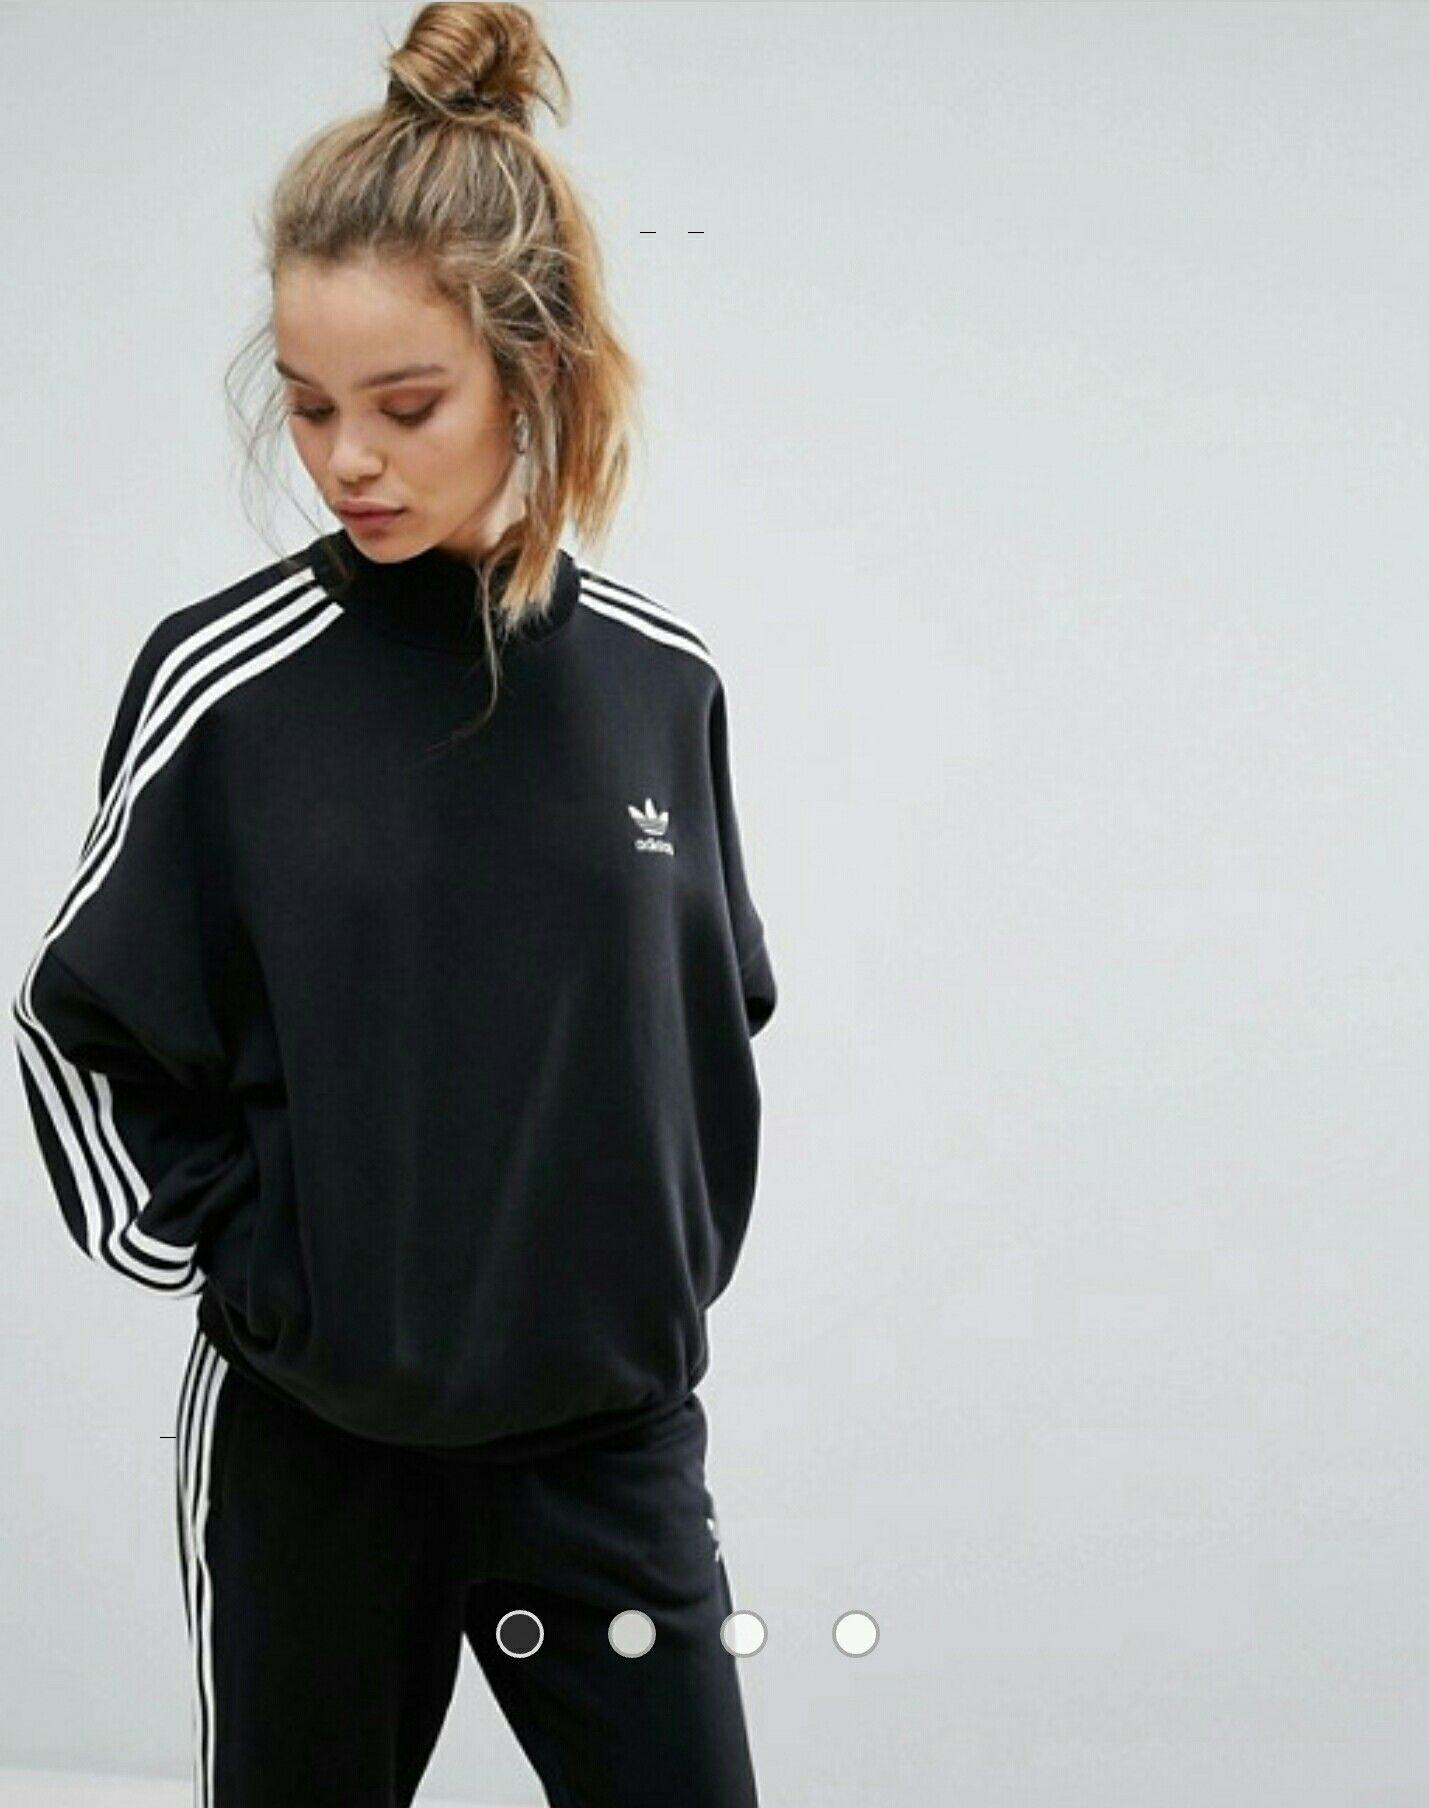 Pin By Diana Cardoso On Virtual Wardrobe Adidas Sweatshirt Women Adidas Outfit Loungewear Fashion [ 1808 x 1429 Pixel ]